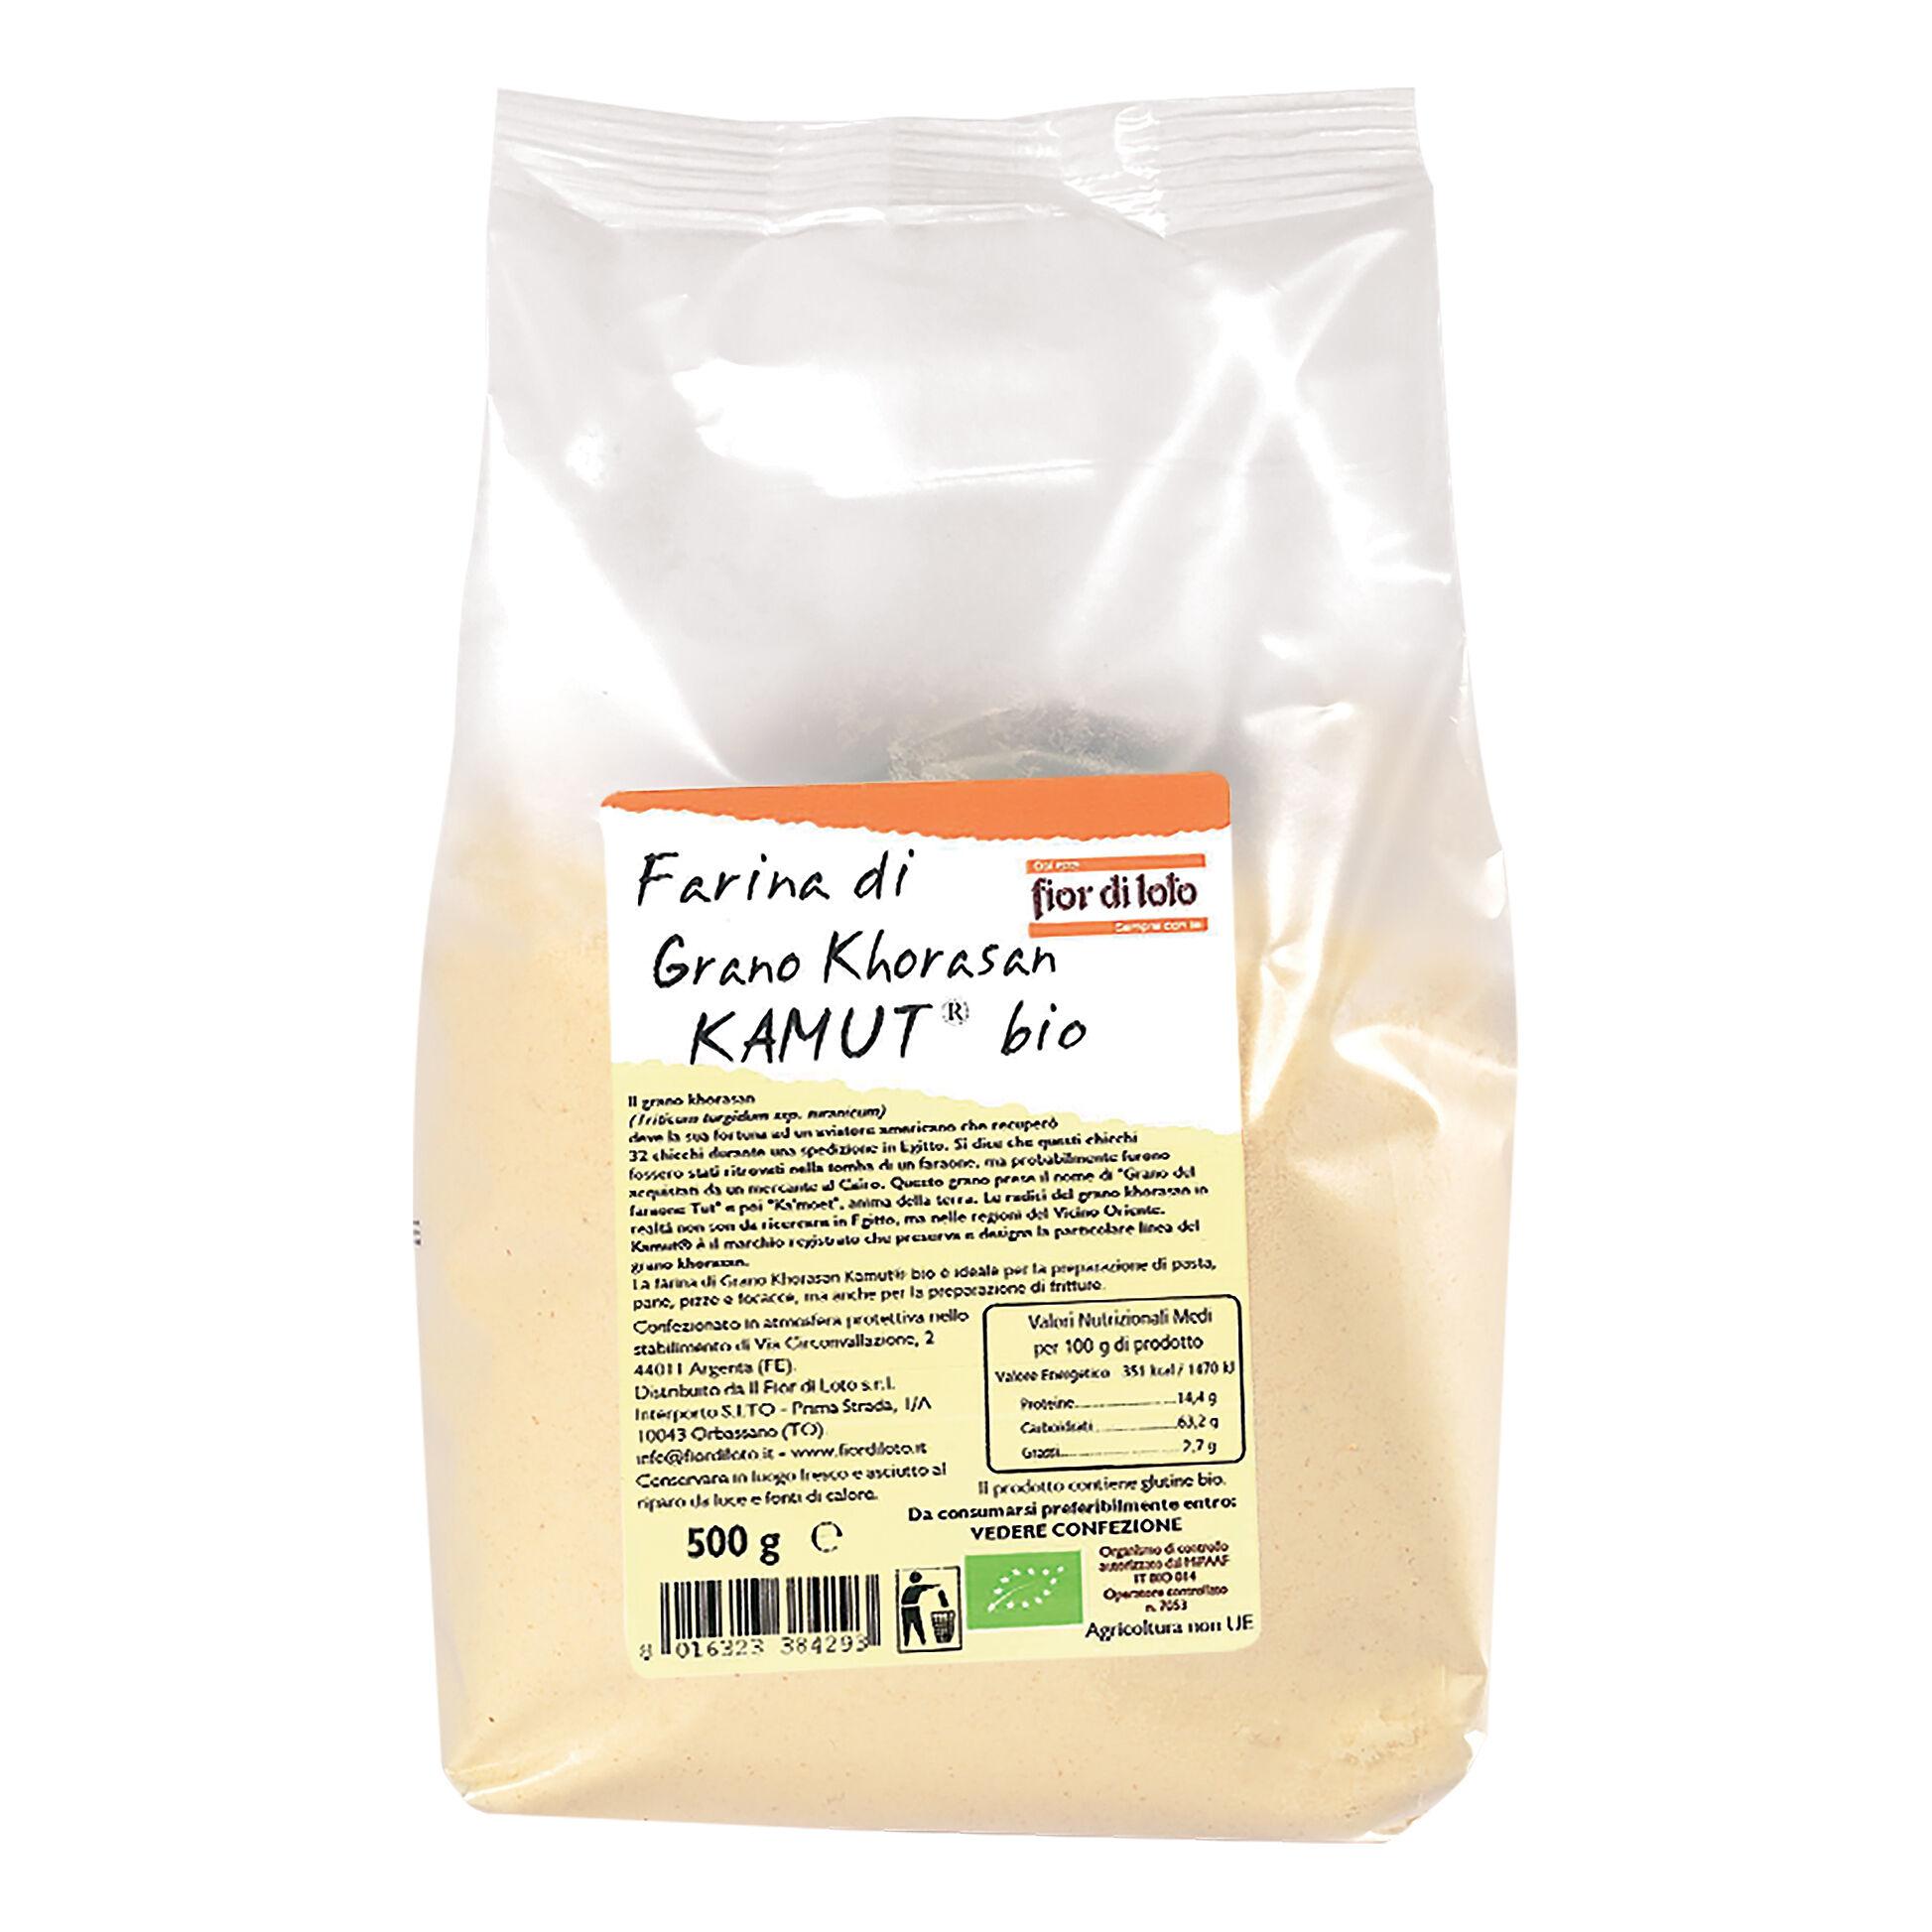 Biotobio Farina Kamut Bi 500g (Fdl)